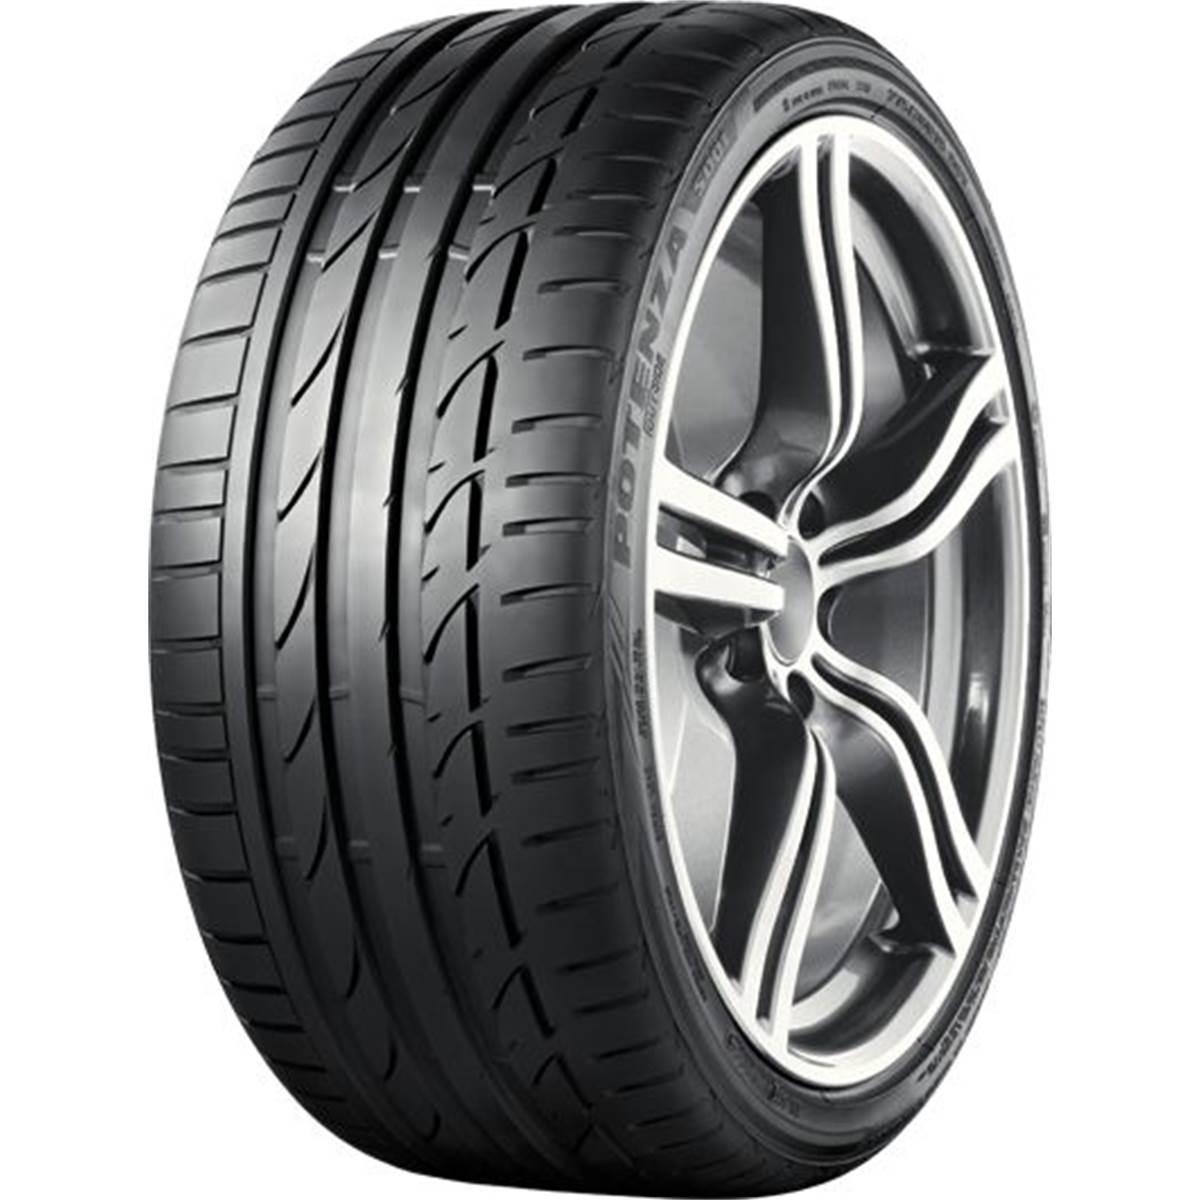 Bridgestone Bridgestone Potenza S001 235/40 R19 96 Y Xl